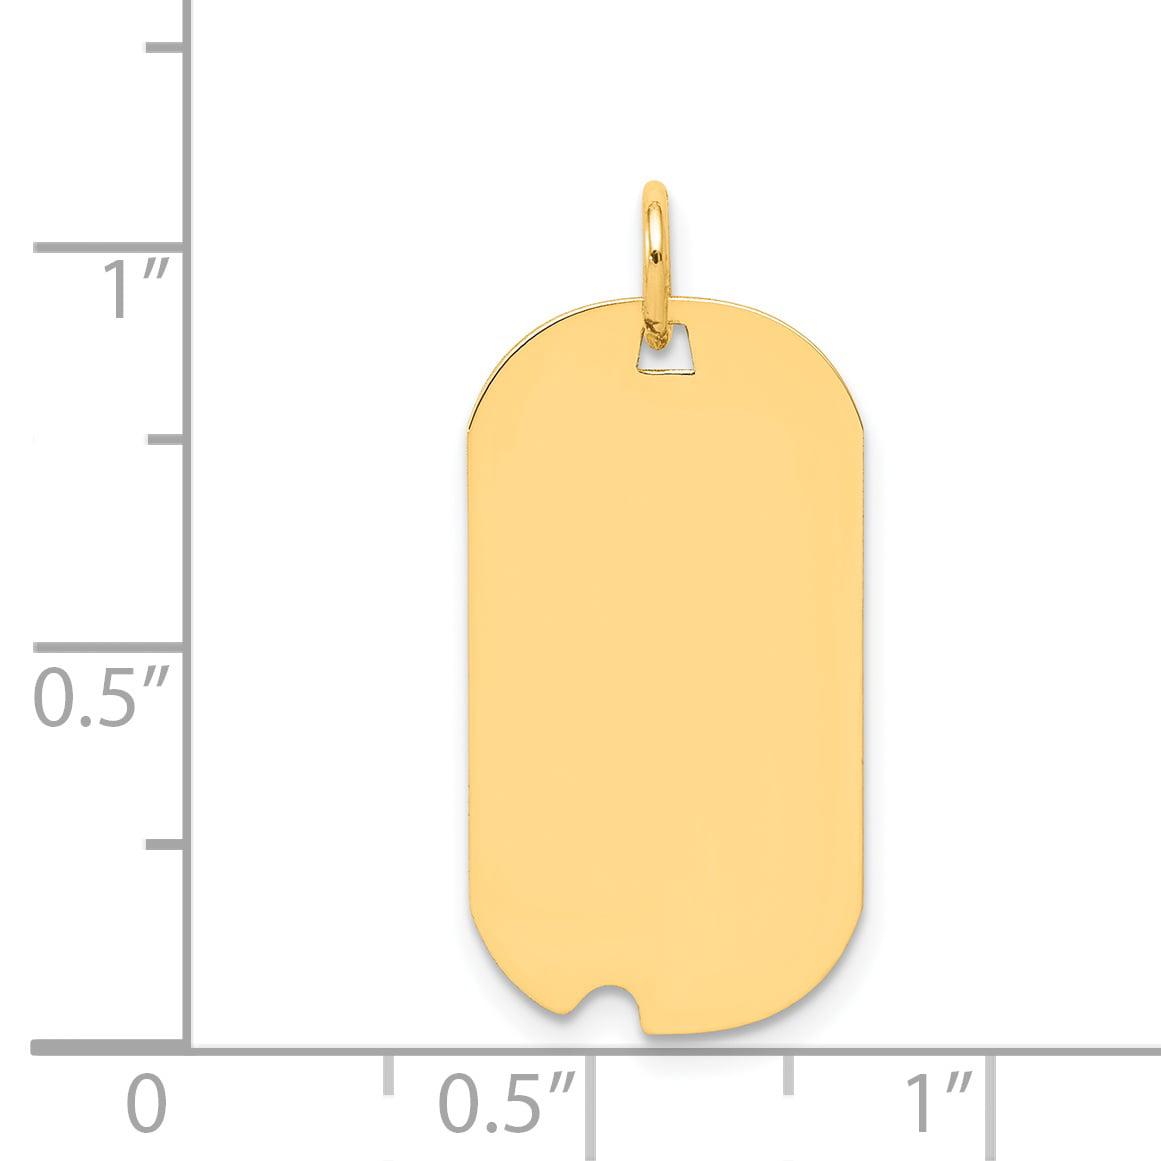 14K Yellow Gold Plain .013 Gauge Engravable Dog Tag w/Notch Disc Charm - image 1 of 2